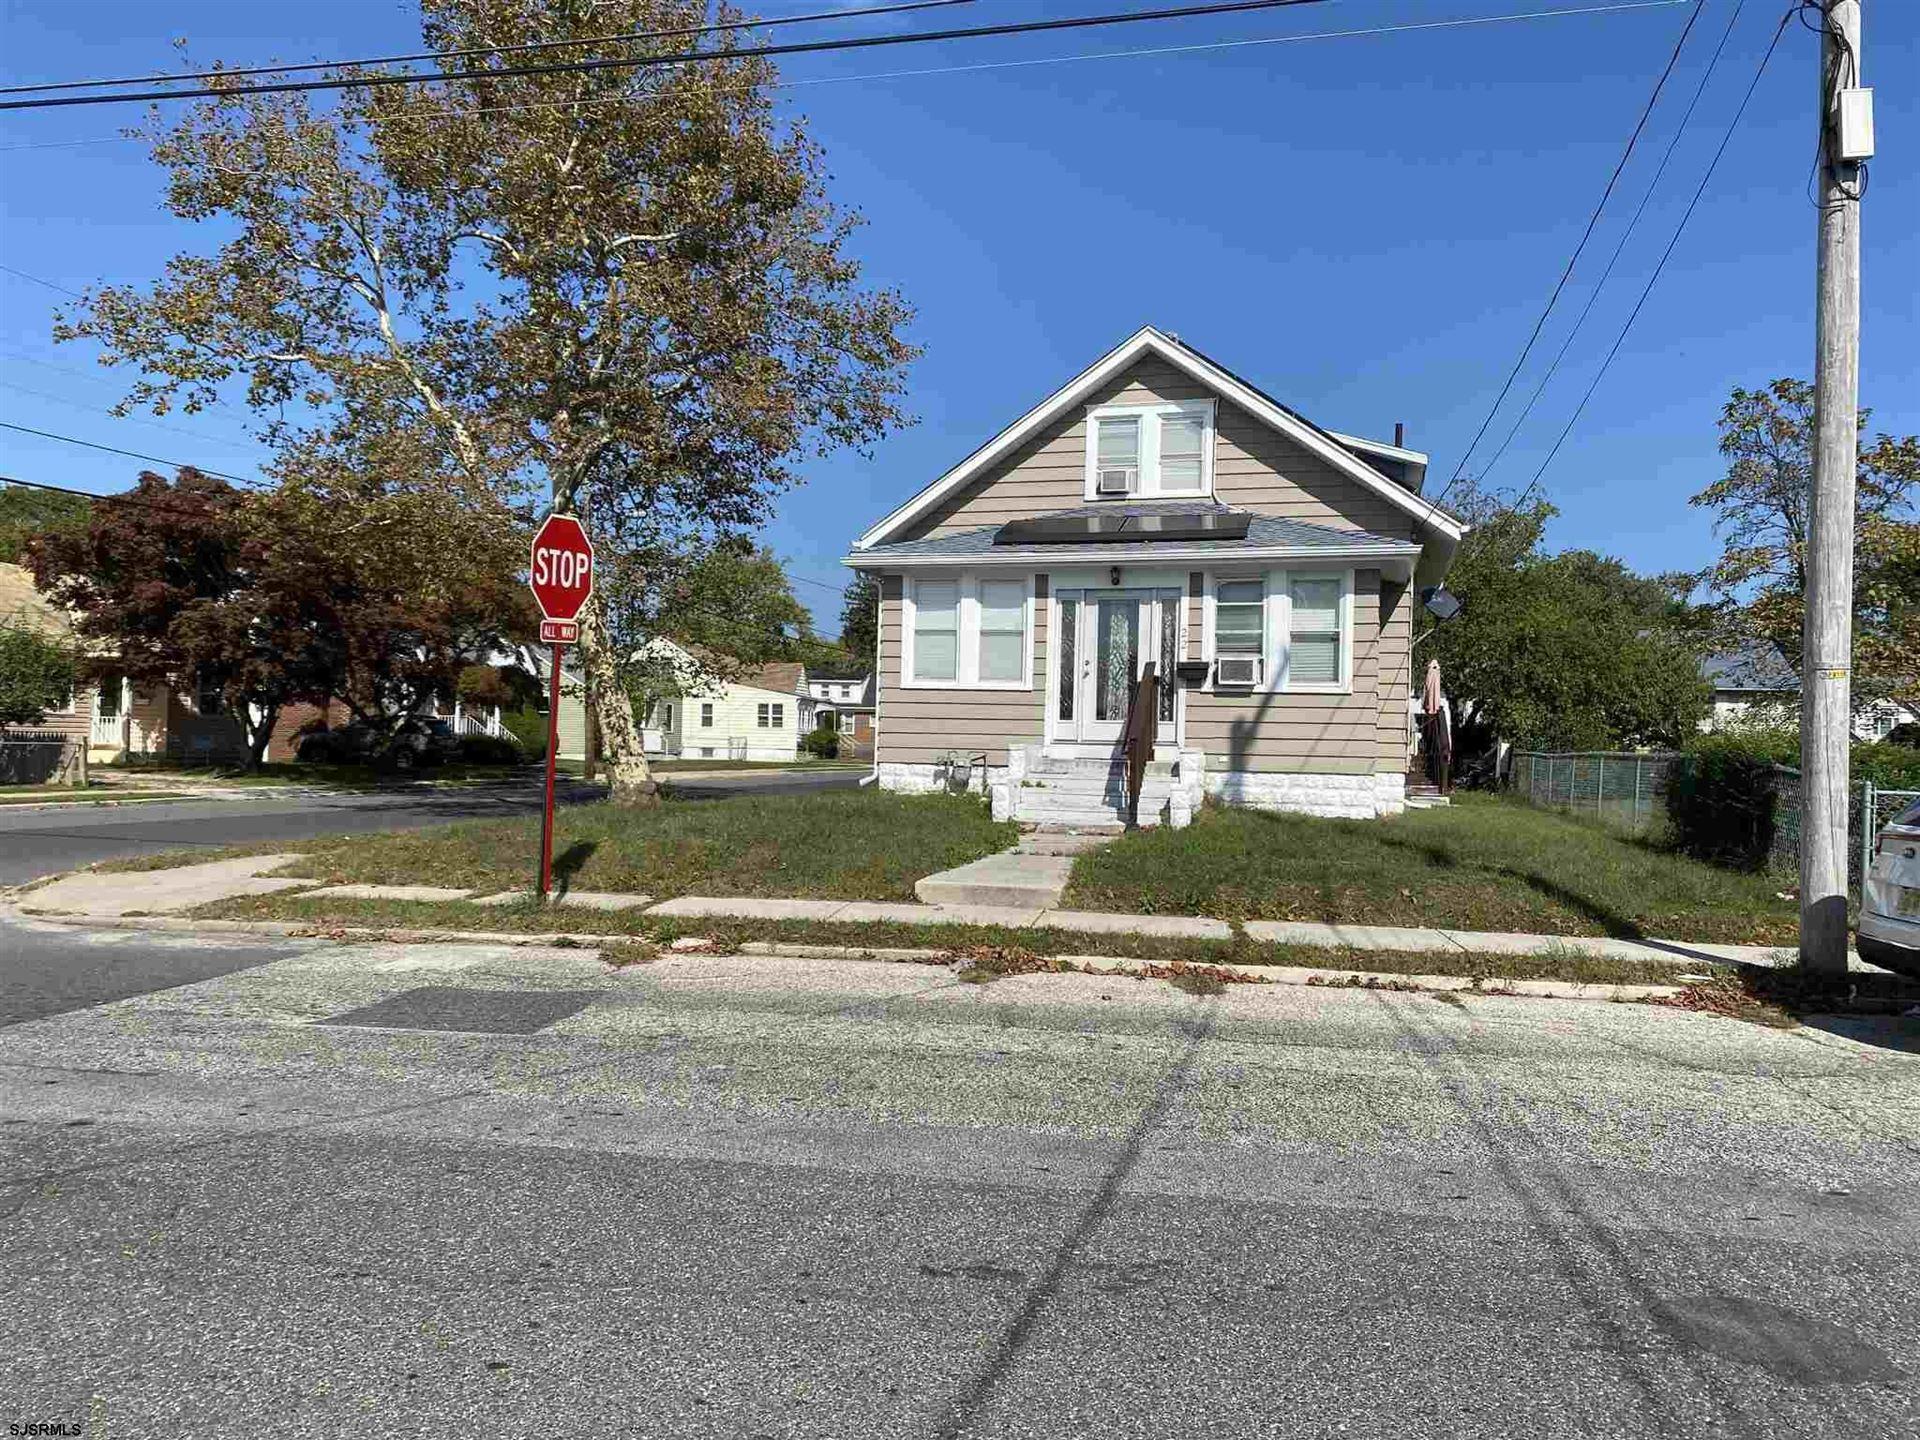 22 W Reading Ave, Pleasantville, NJ 08232 - #: 556546